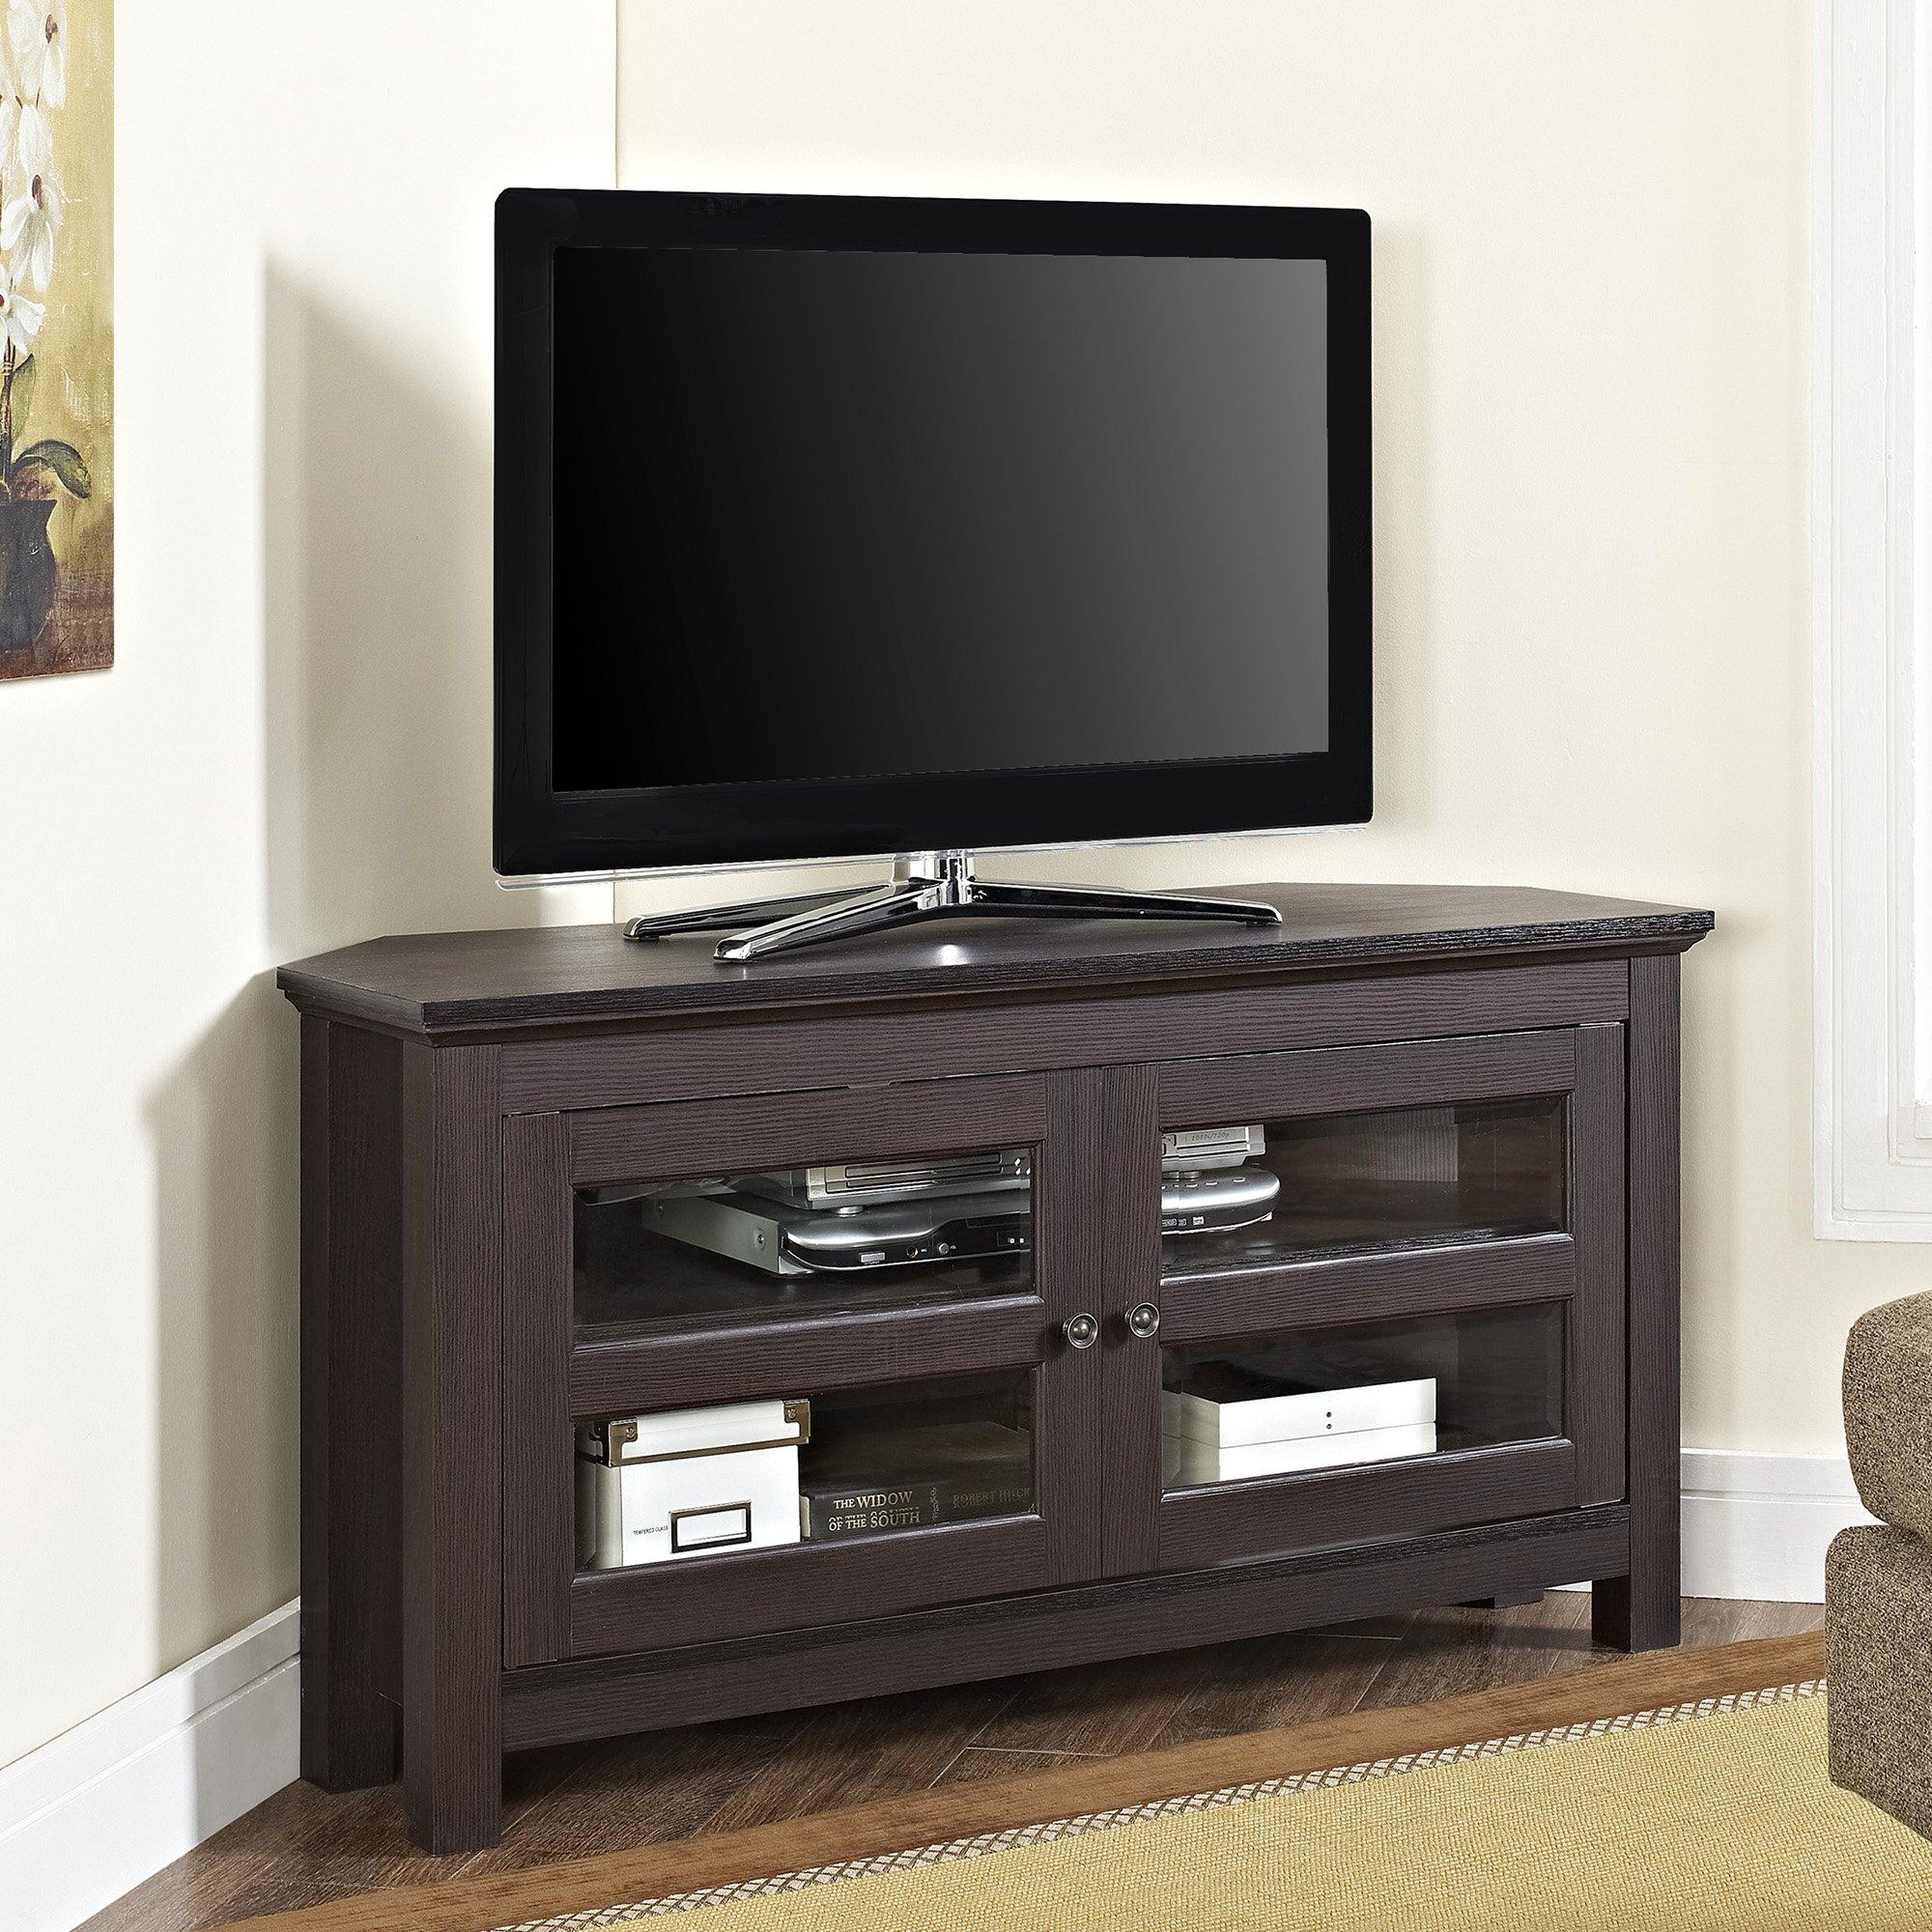 WE Furniture 44'' Cordoba Corner TV Stand Console, Espresso